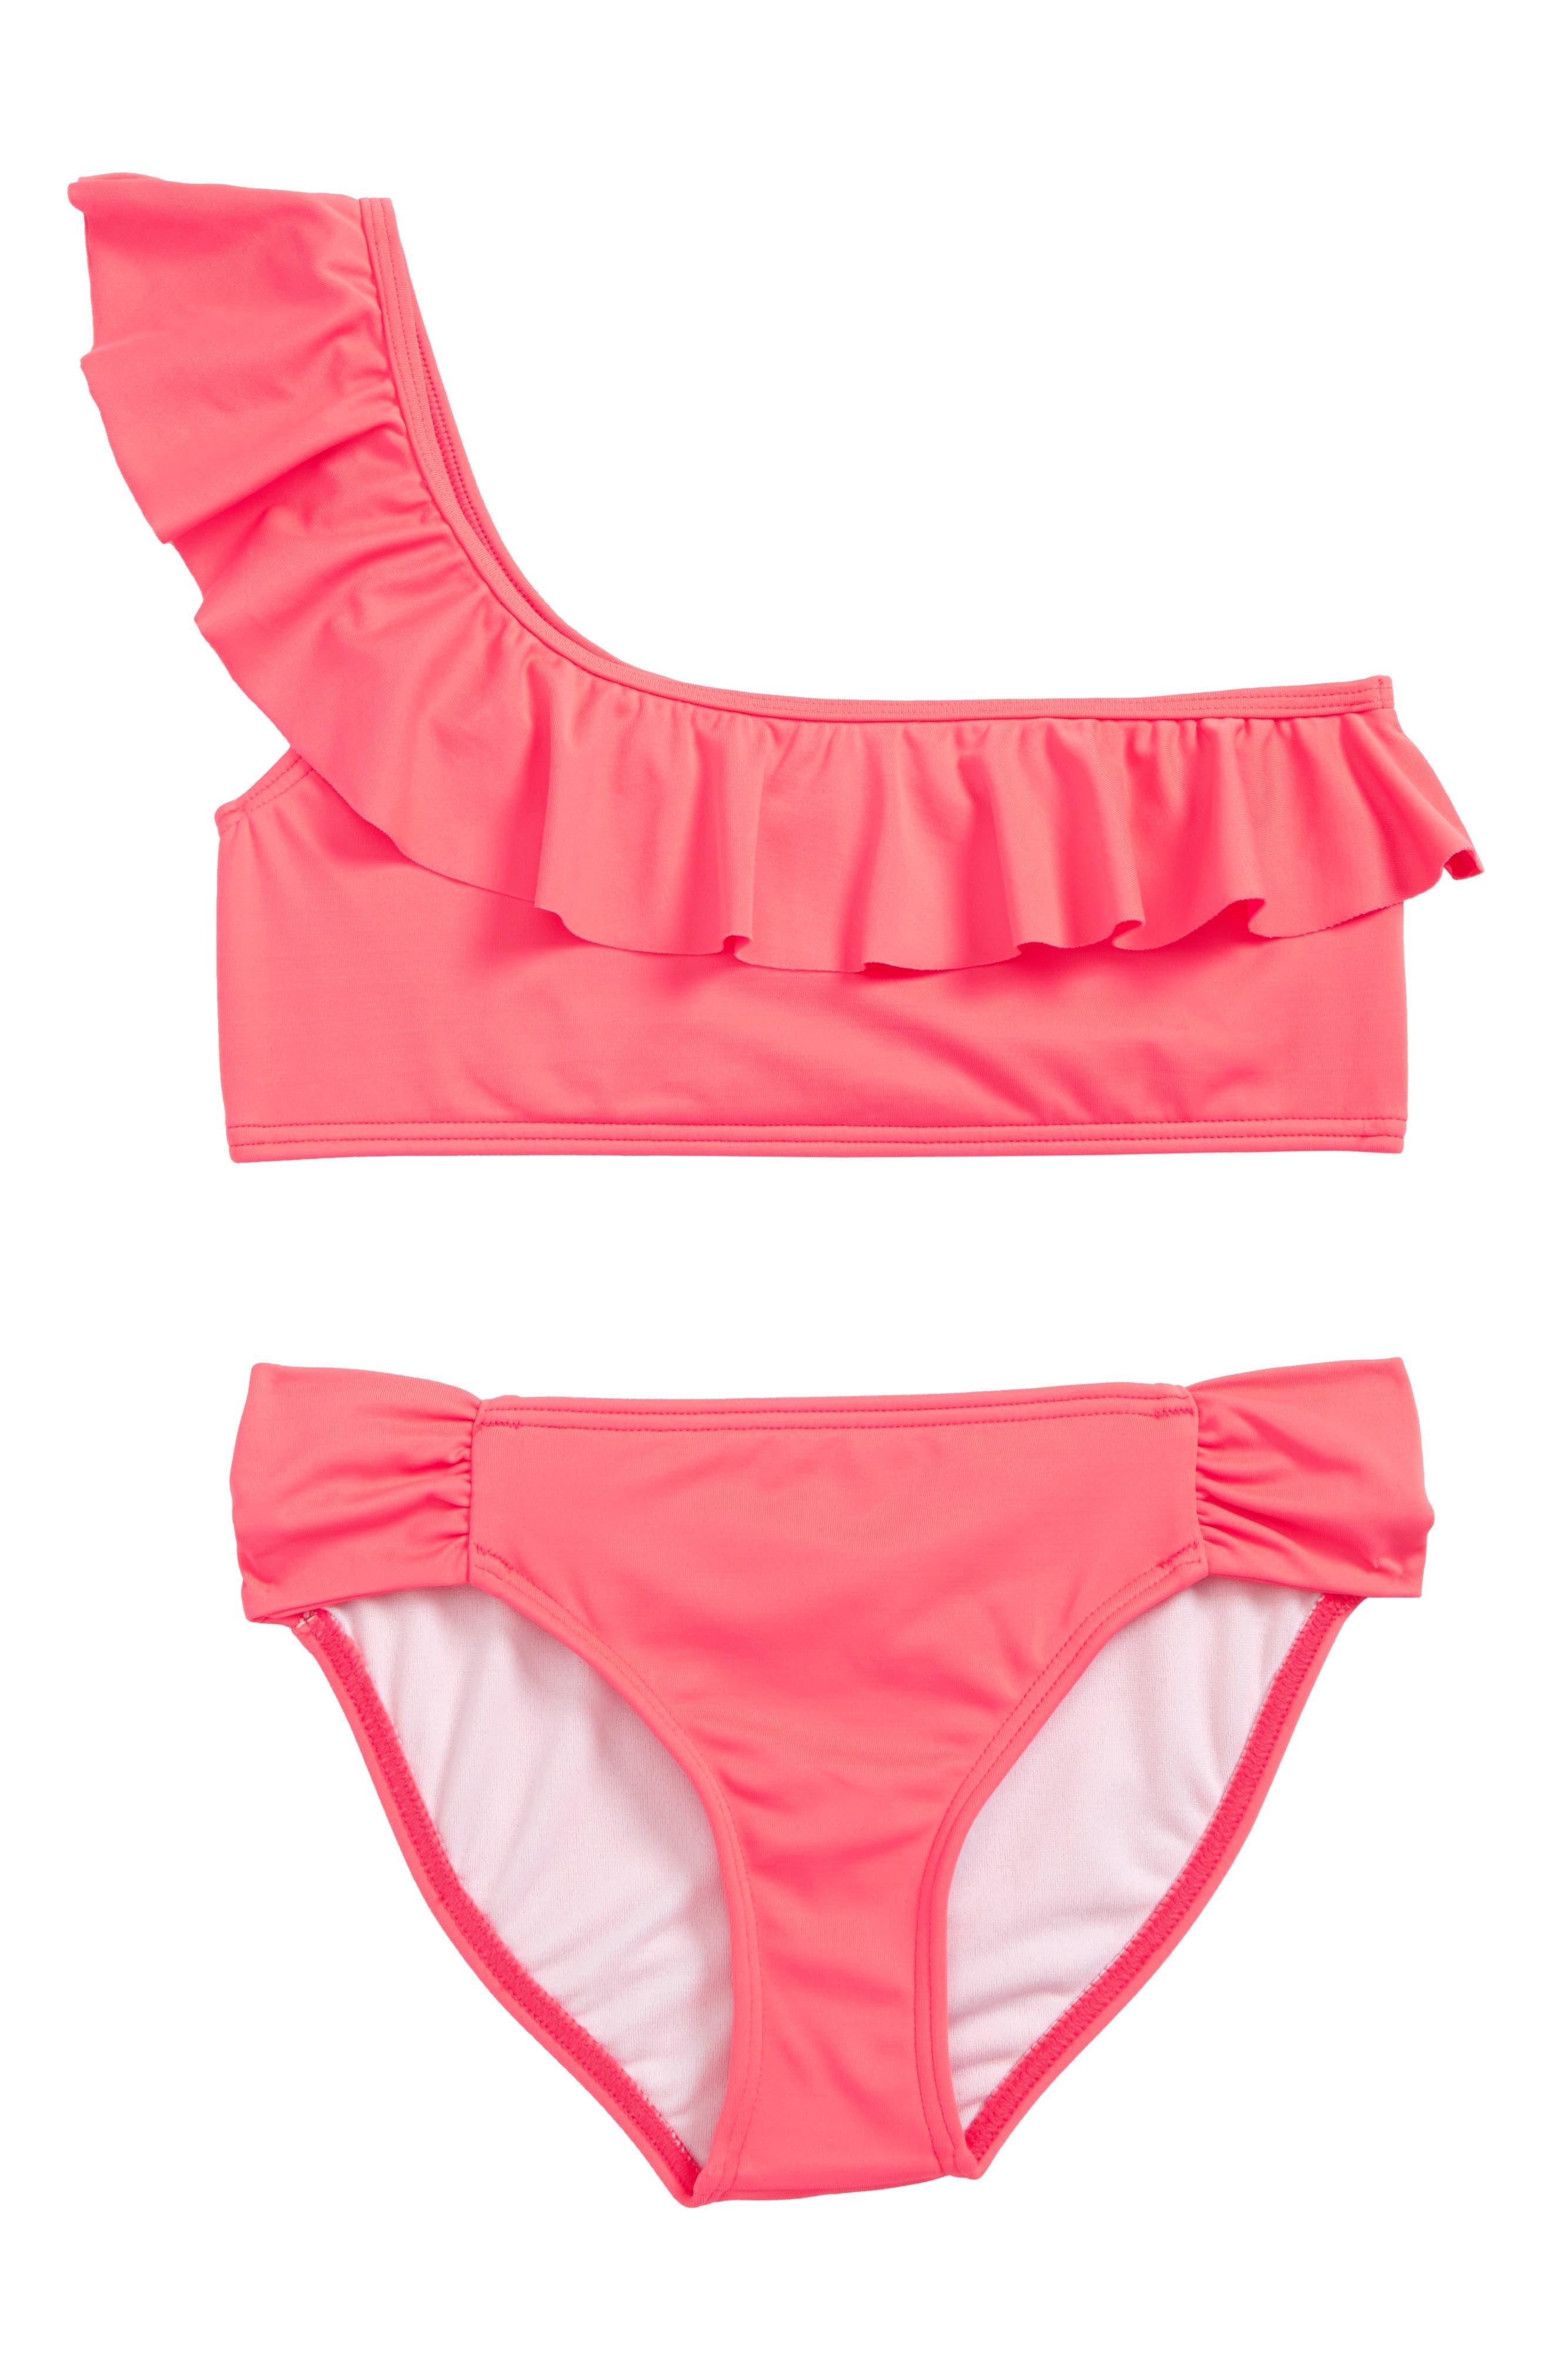 Alternate Image 1 Selected - Billabong Sol Searcher Two-Piece Swimsuit (Little Girls & Big Girls)